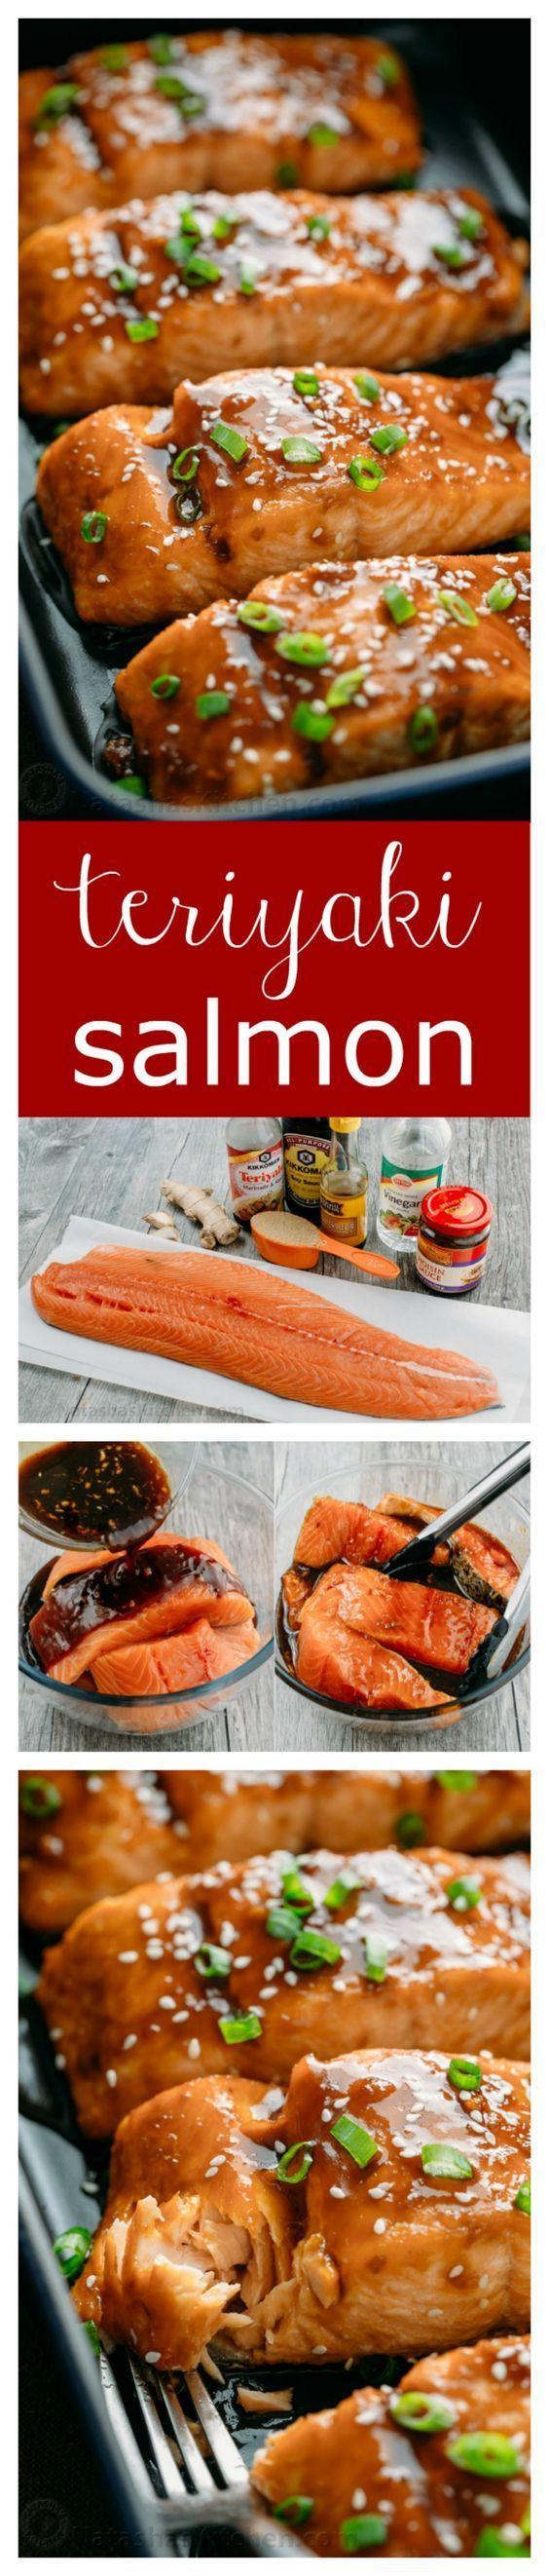 Teriyaki Salmon This teriyaki salmon recipe is a winner! Simple ingredients and no lengthy marinating needed. A flaky juicy and delicious teriyaki glazed